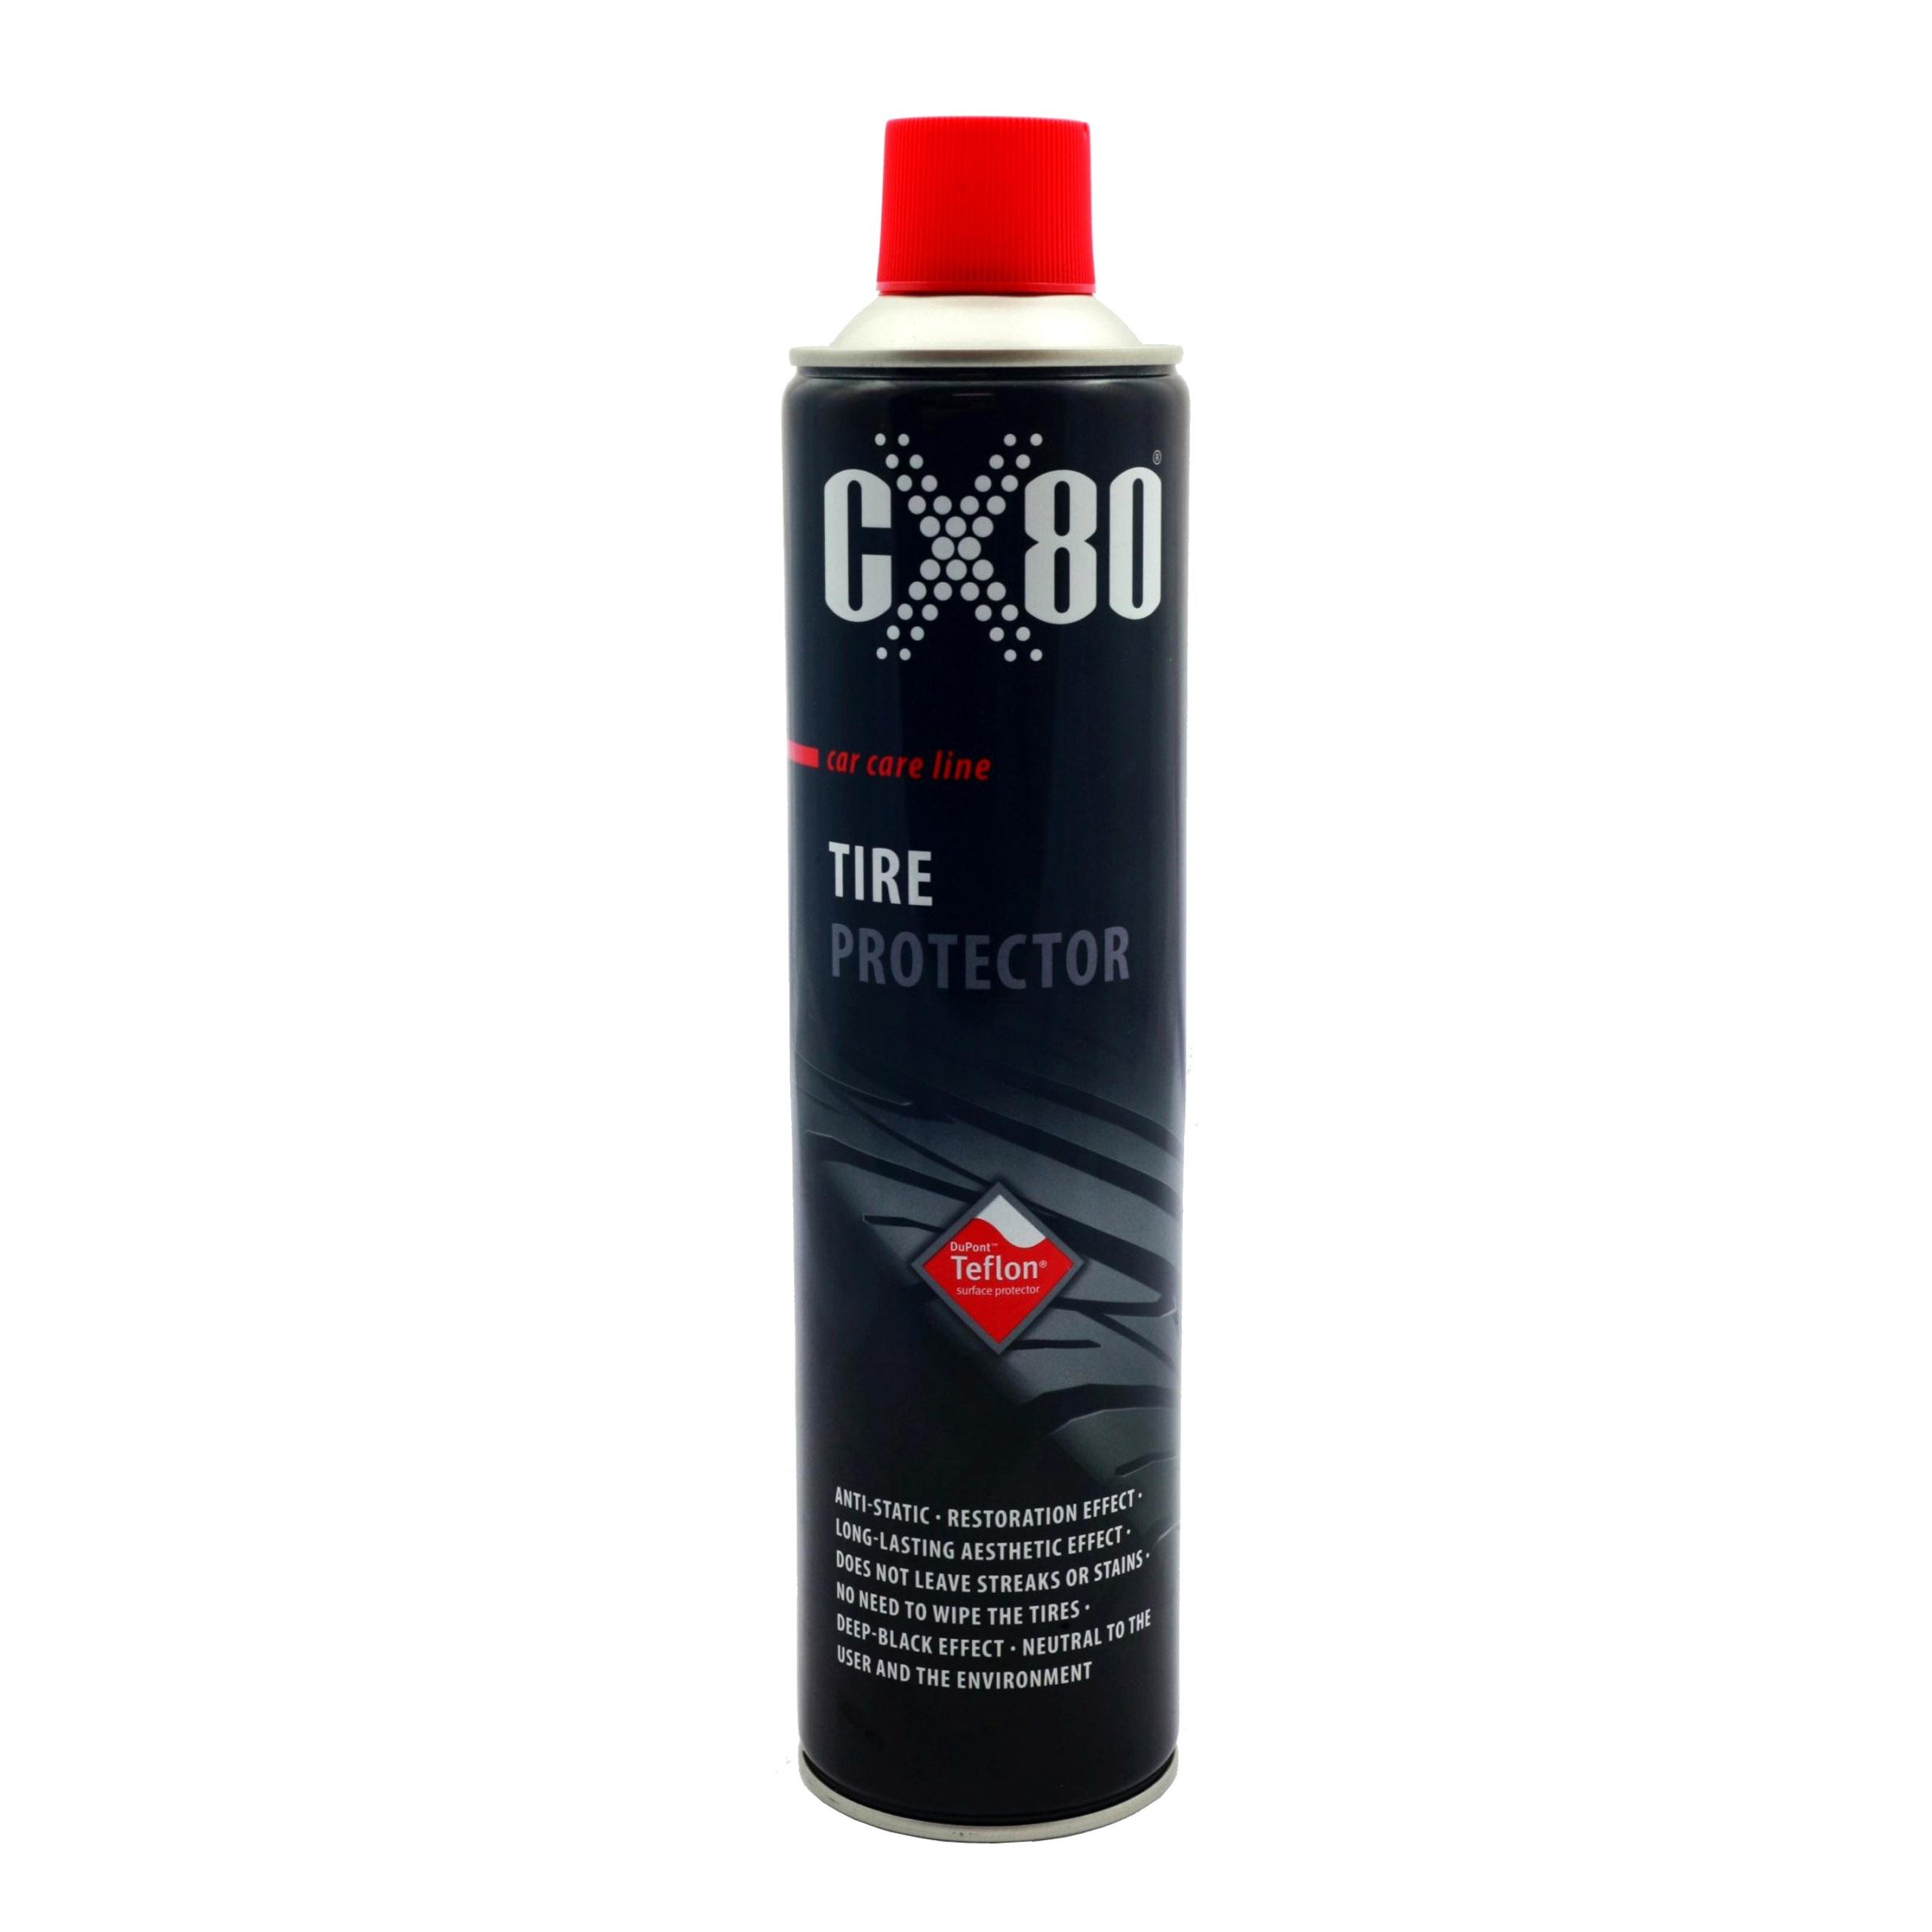 CX80 TIRE ПРОТЕКТОР - Обслуживание шин